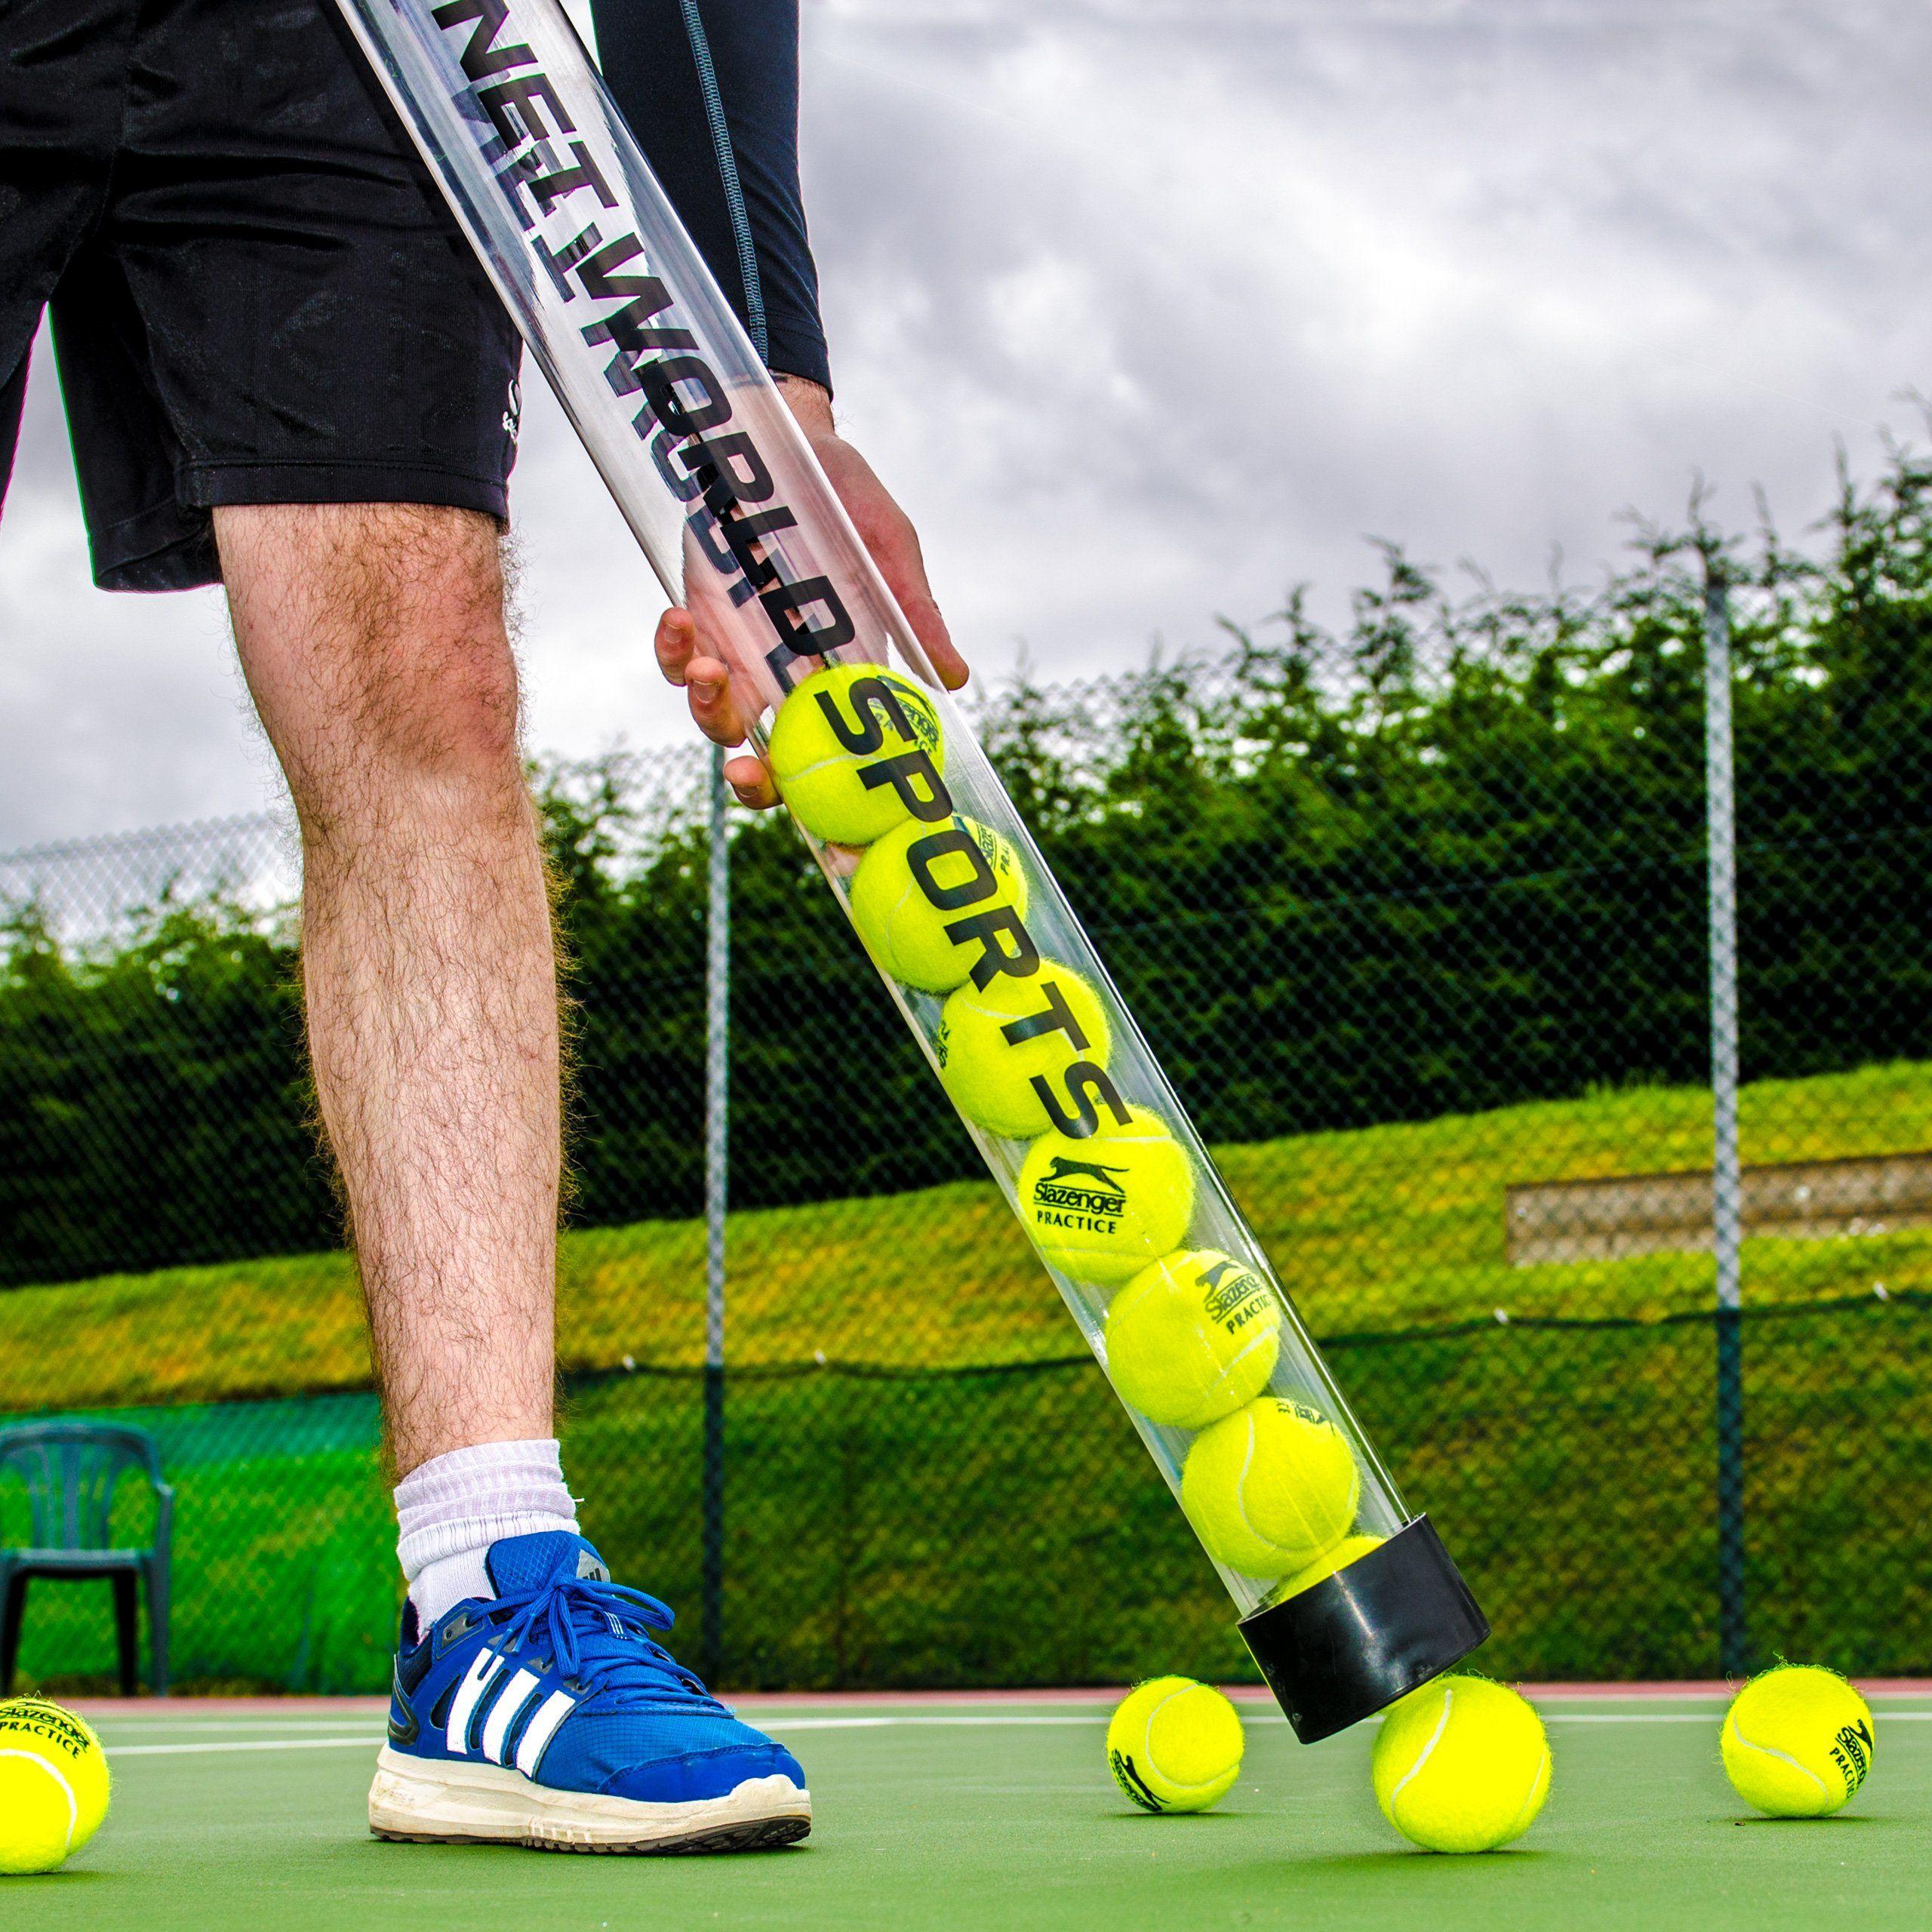 Tennis Ball Pick Up Tube Ball Collector Holds 15 Tennis Balls Net World Sports 15 Ball Capacity Lightweight See Through Tennis Ball Sports Tennis Balls